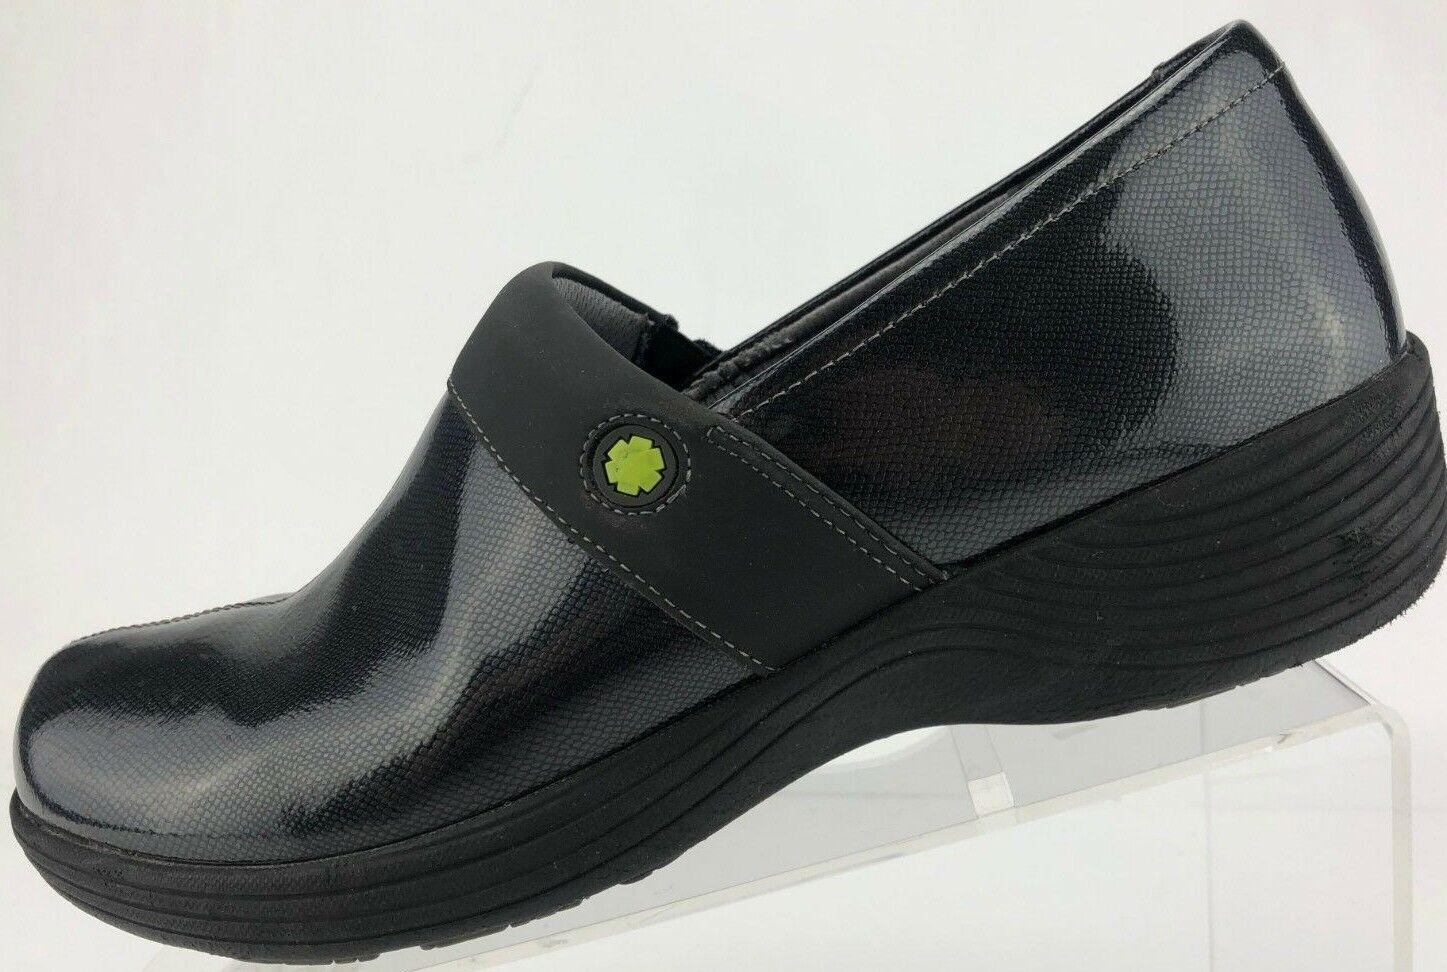 Work Wonders Dansko Clogs Camellia Black Patent Leather shoes Womens Womens Womens 41 10.5 11 80544c